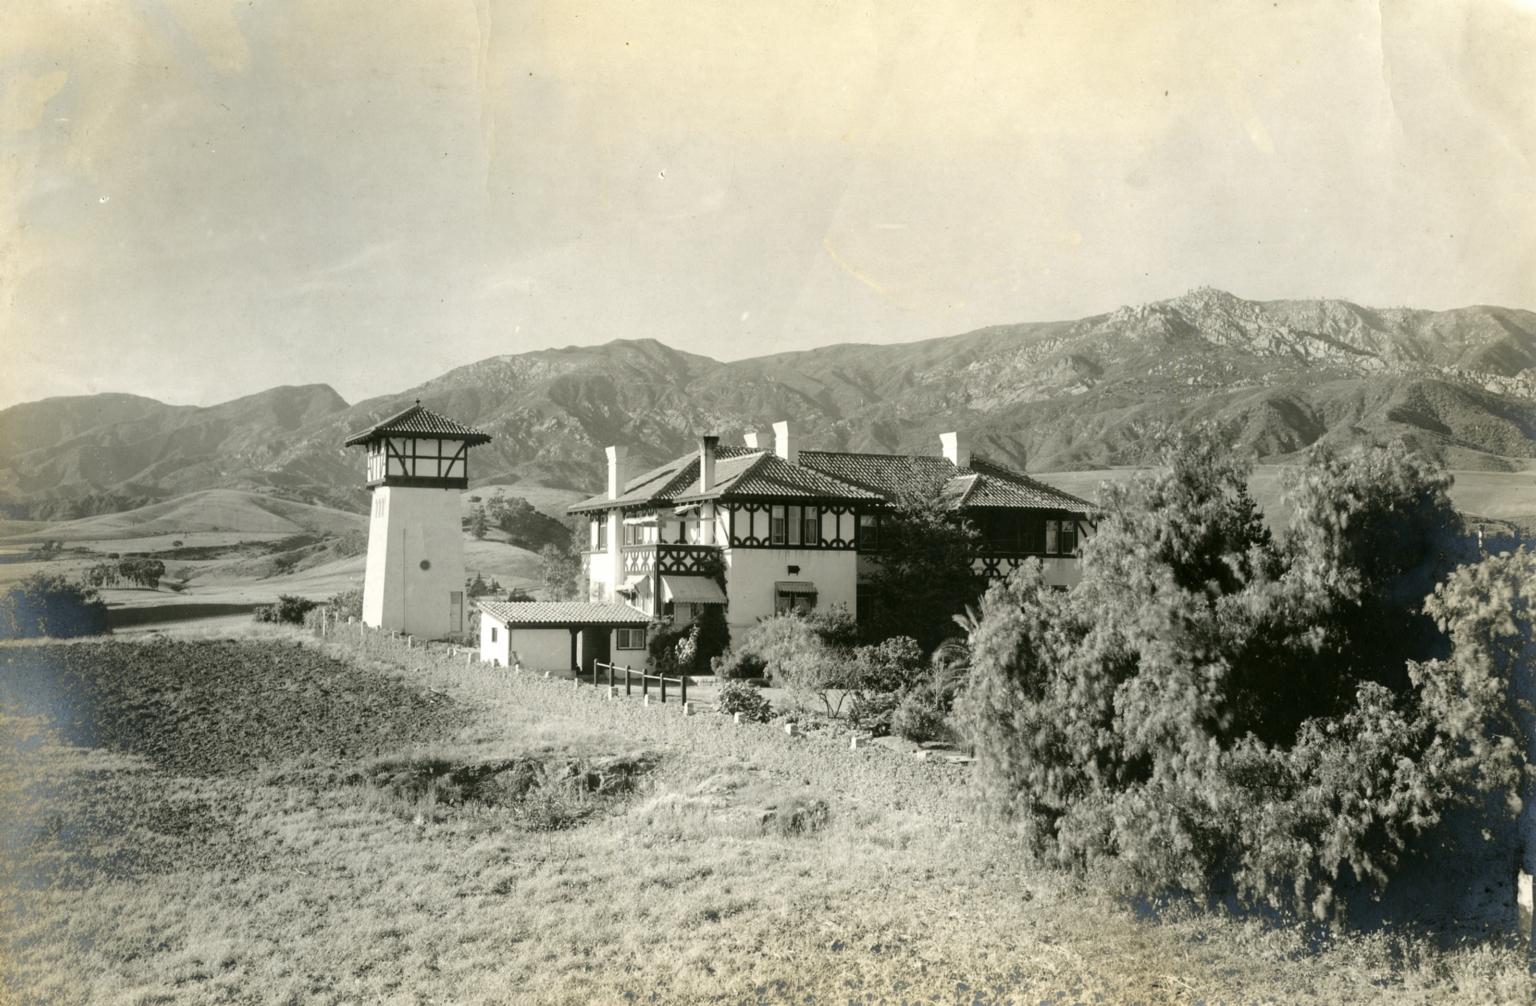 Miradero Sanitarium